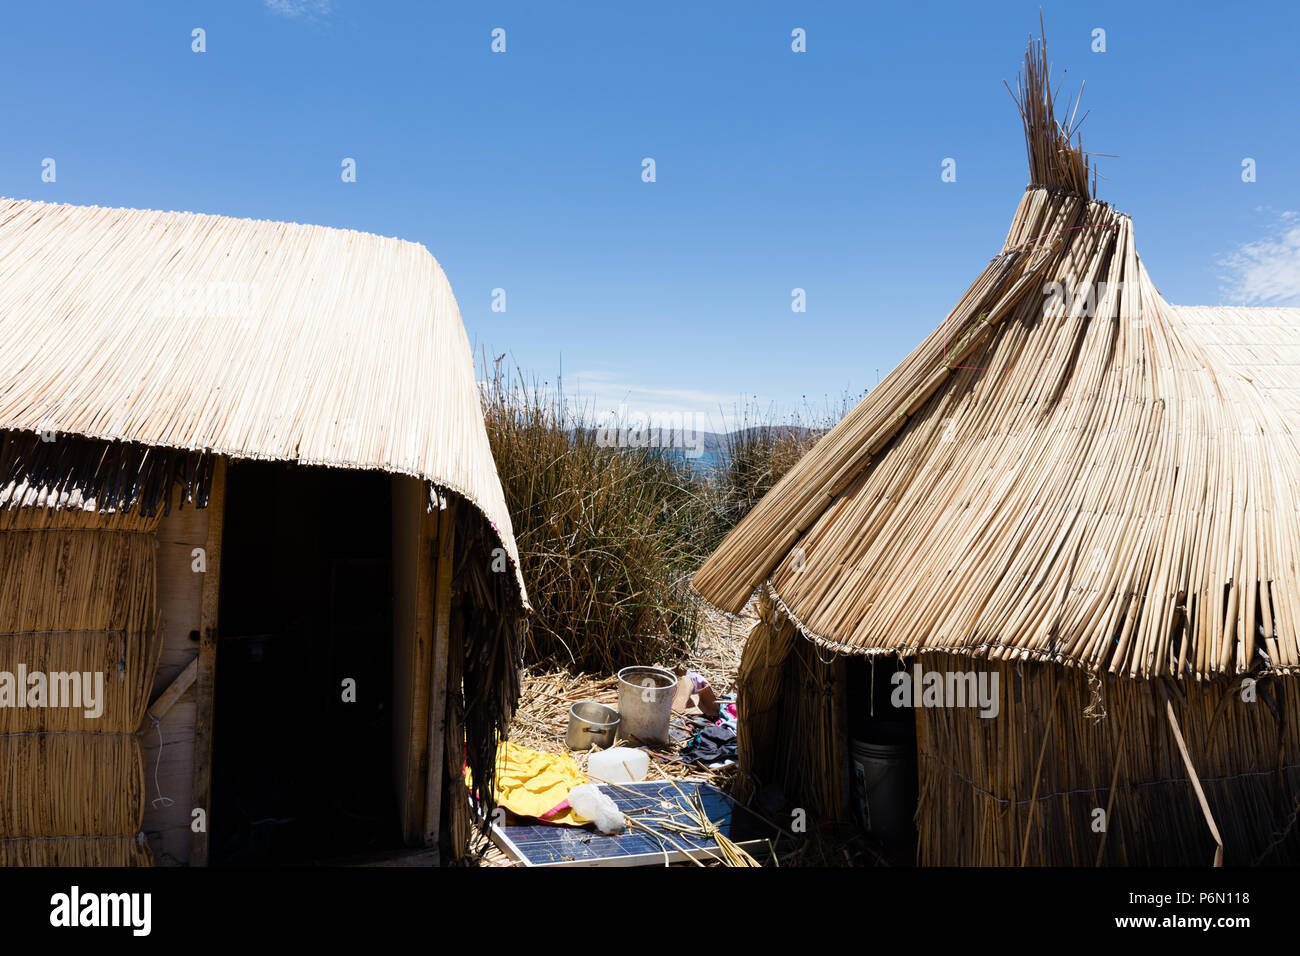 traditional tent on the Titicaca lake near Puno, Peru - Stock Image